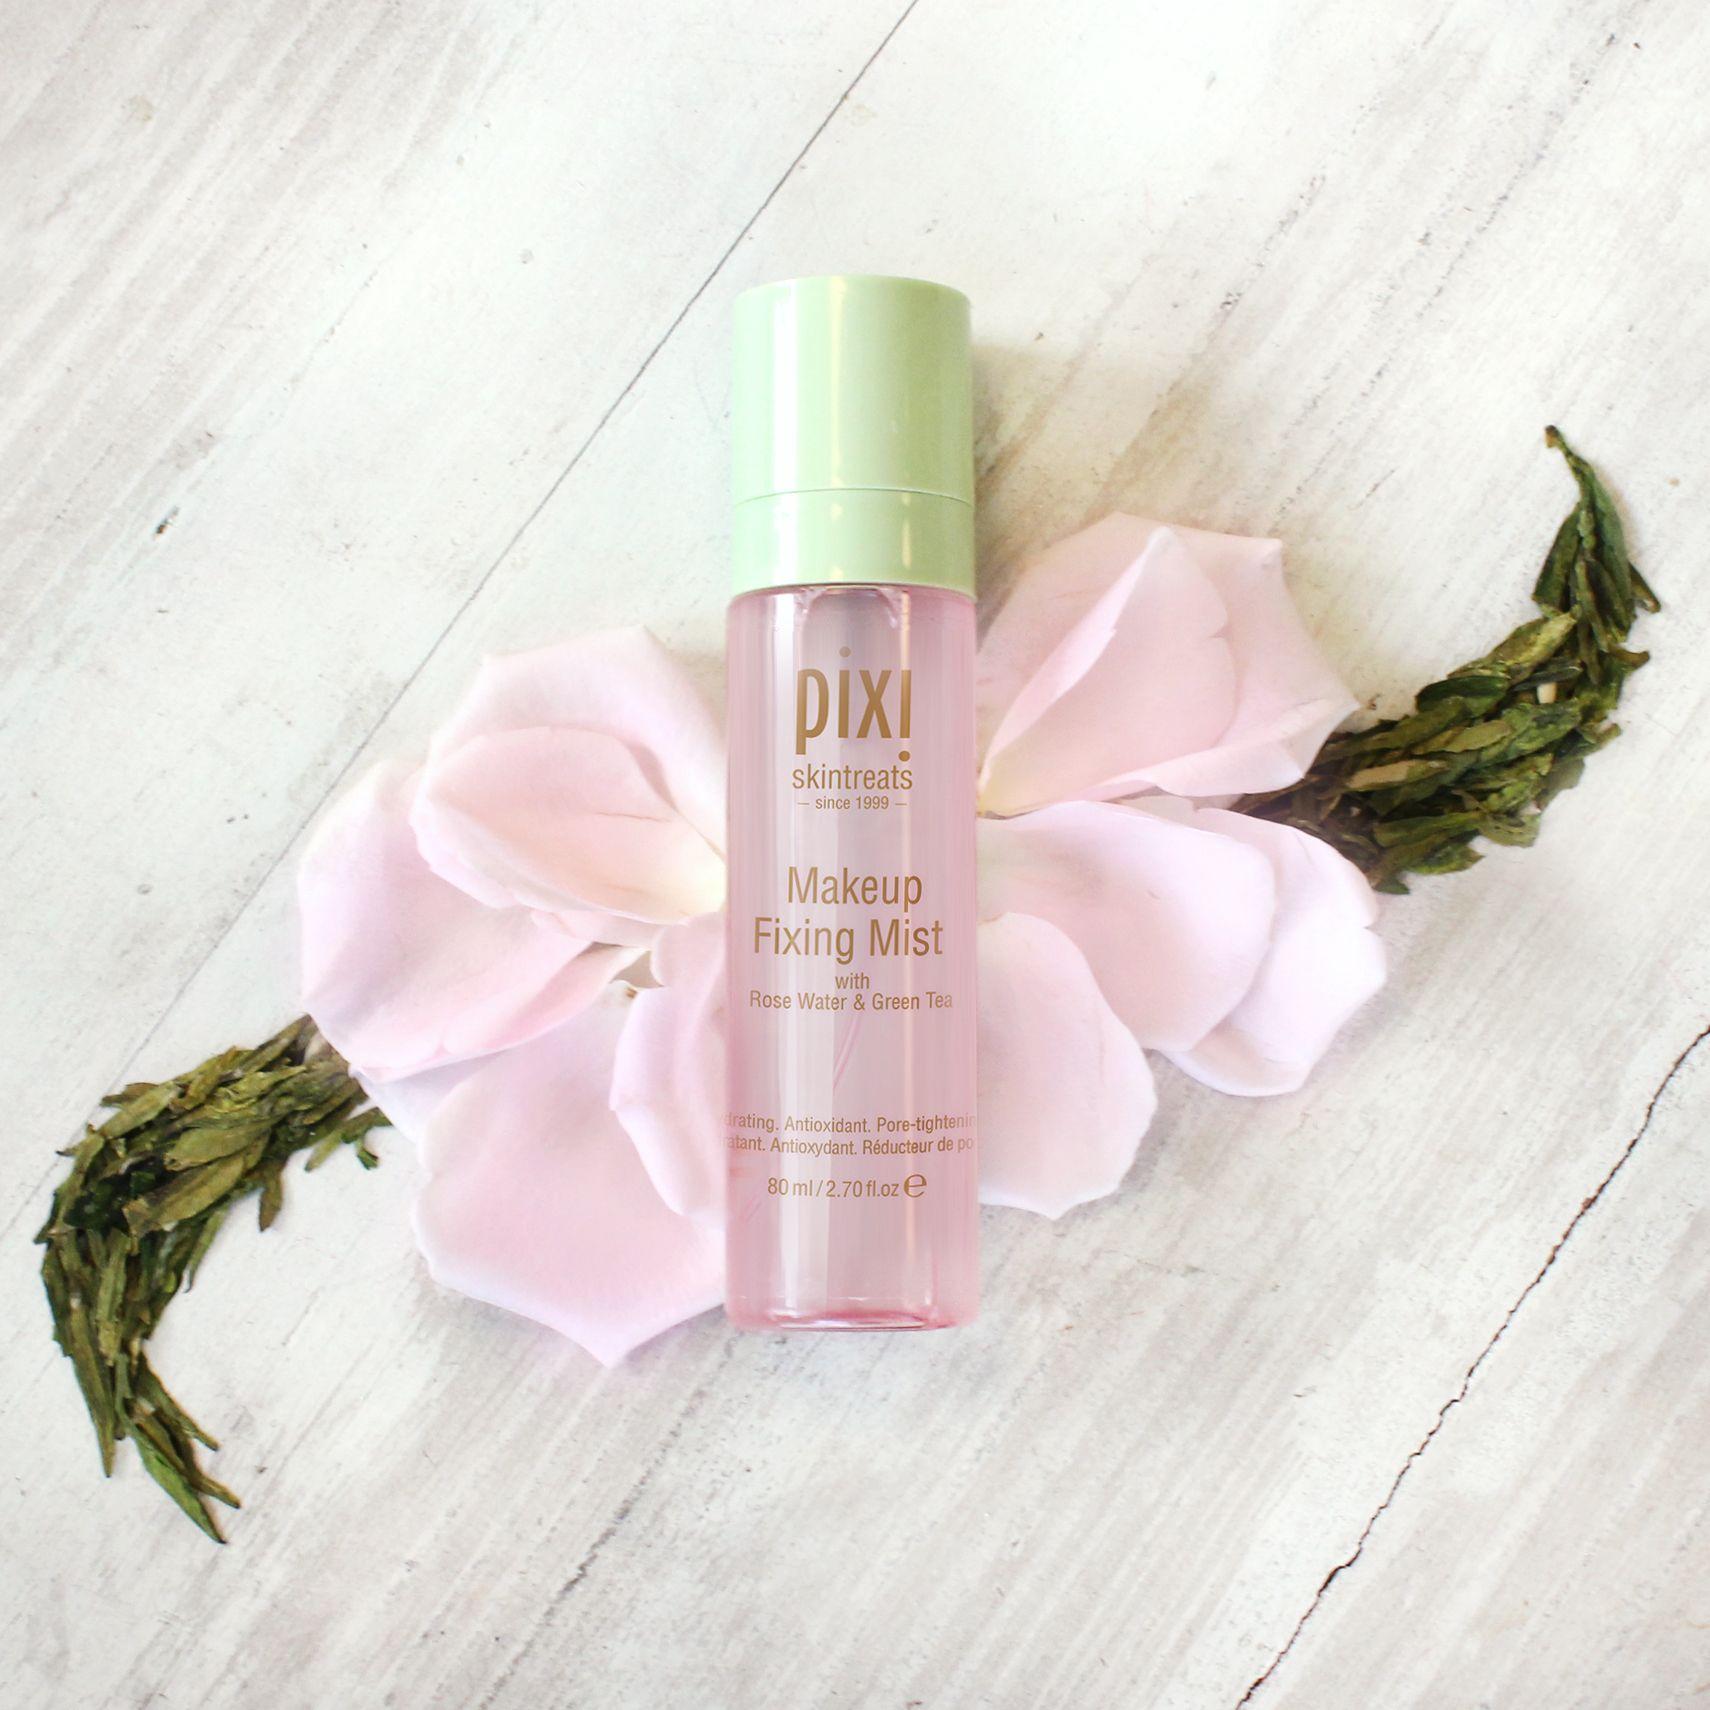 Pixi Makeup Fixing Mist Pixie makeup, Mists, How to